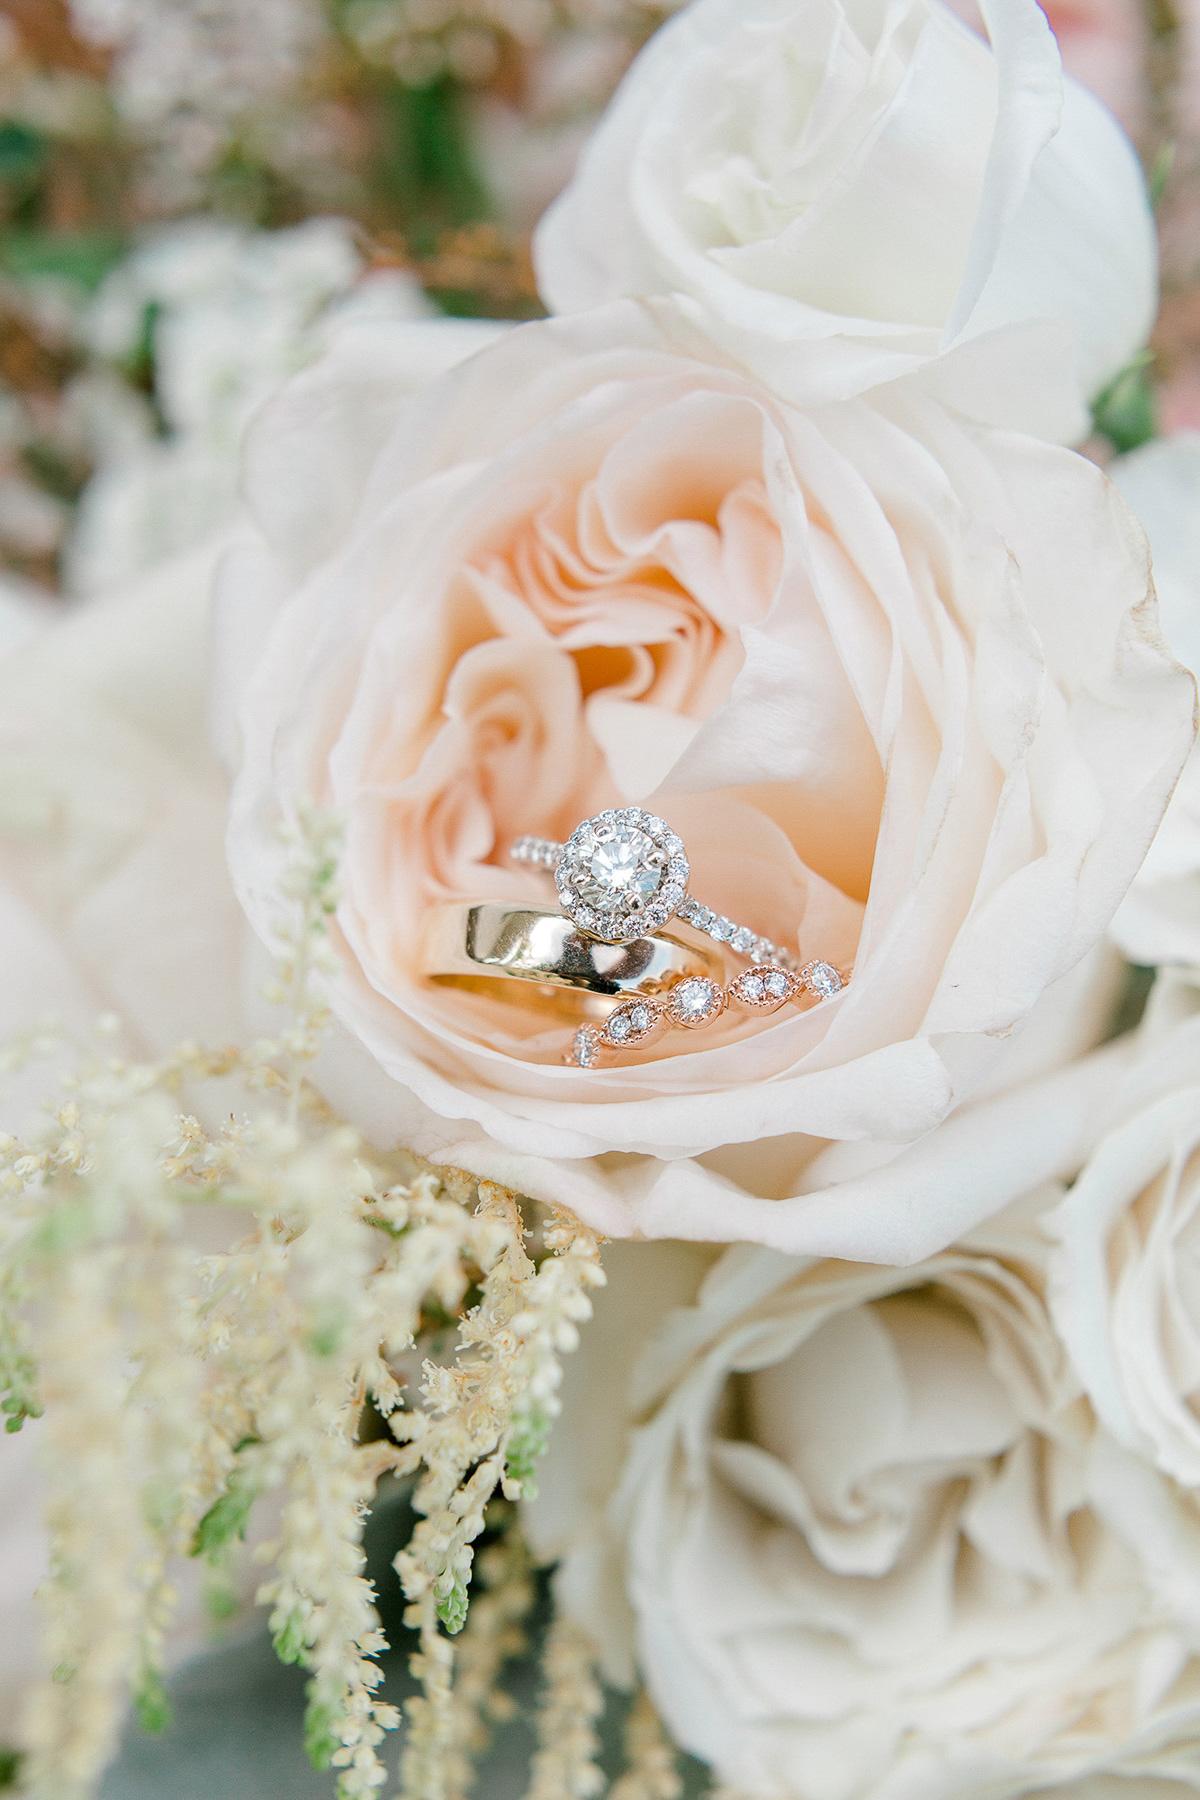 beatrice-elford-photography-vineyard-bride-swish-list-balls-falls-vineland-wedding-7.jpg